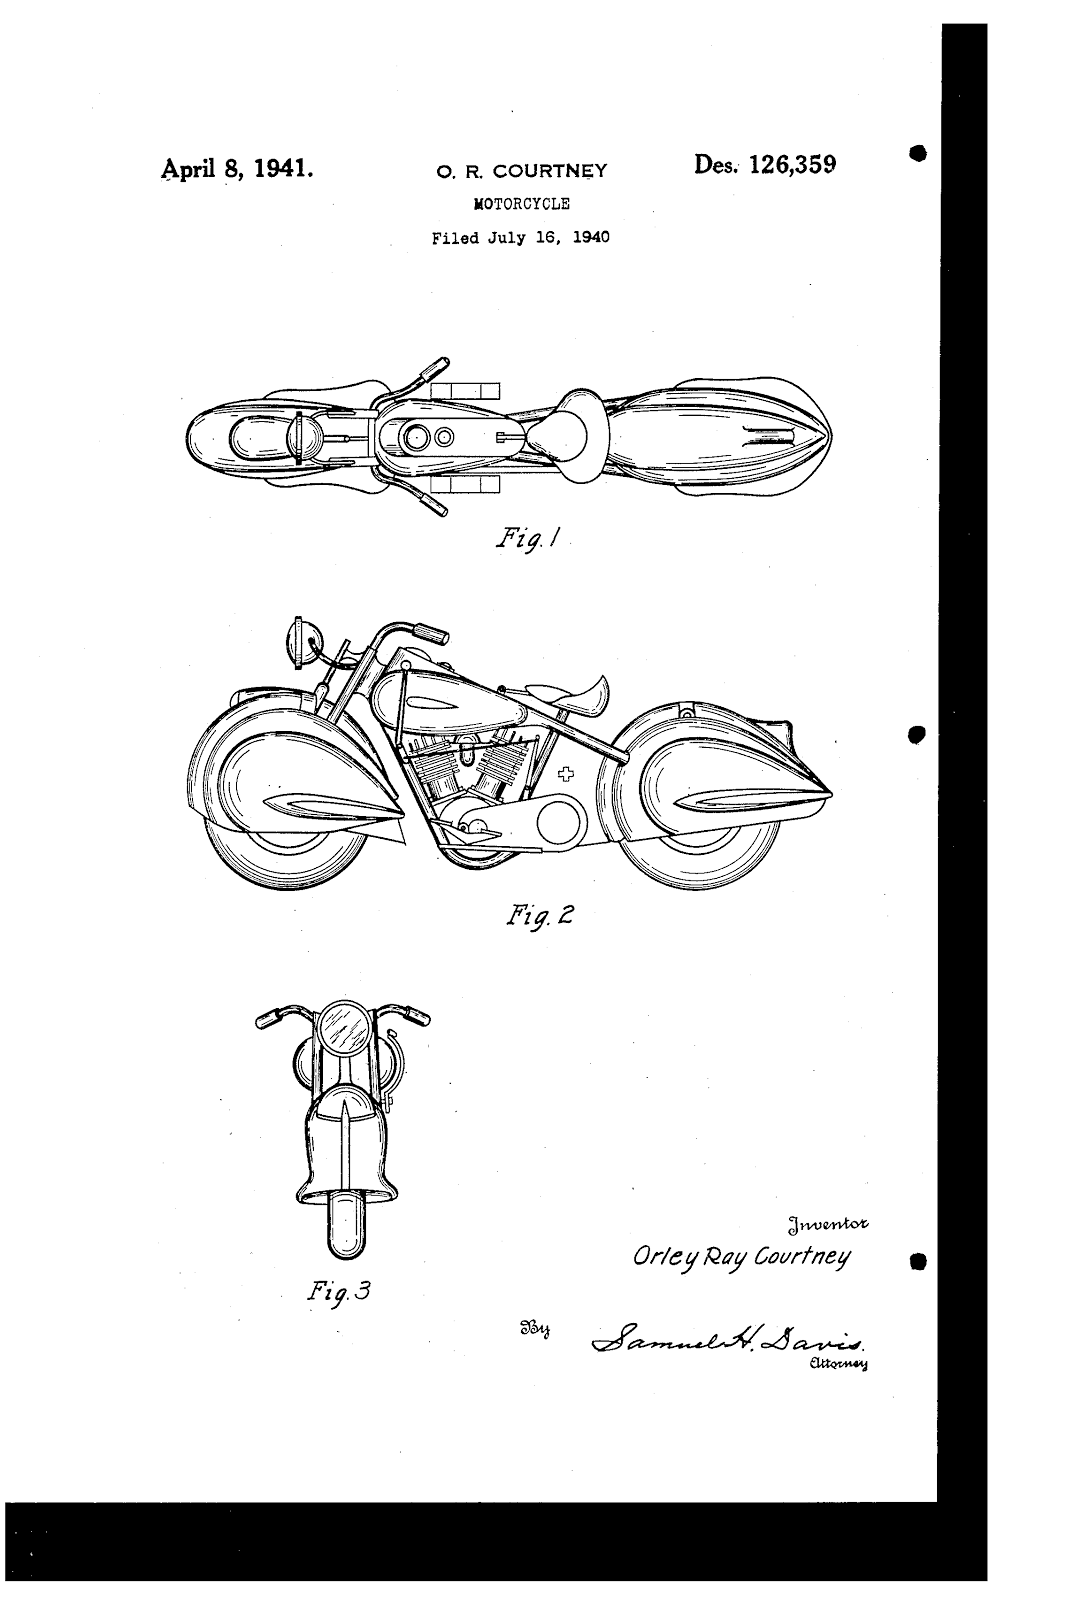 Courtney Aero Squadron motorcycle patent